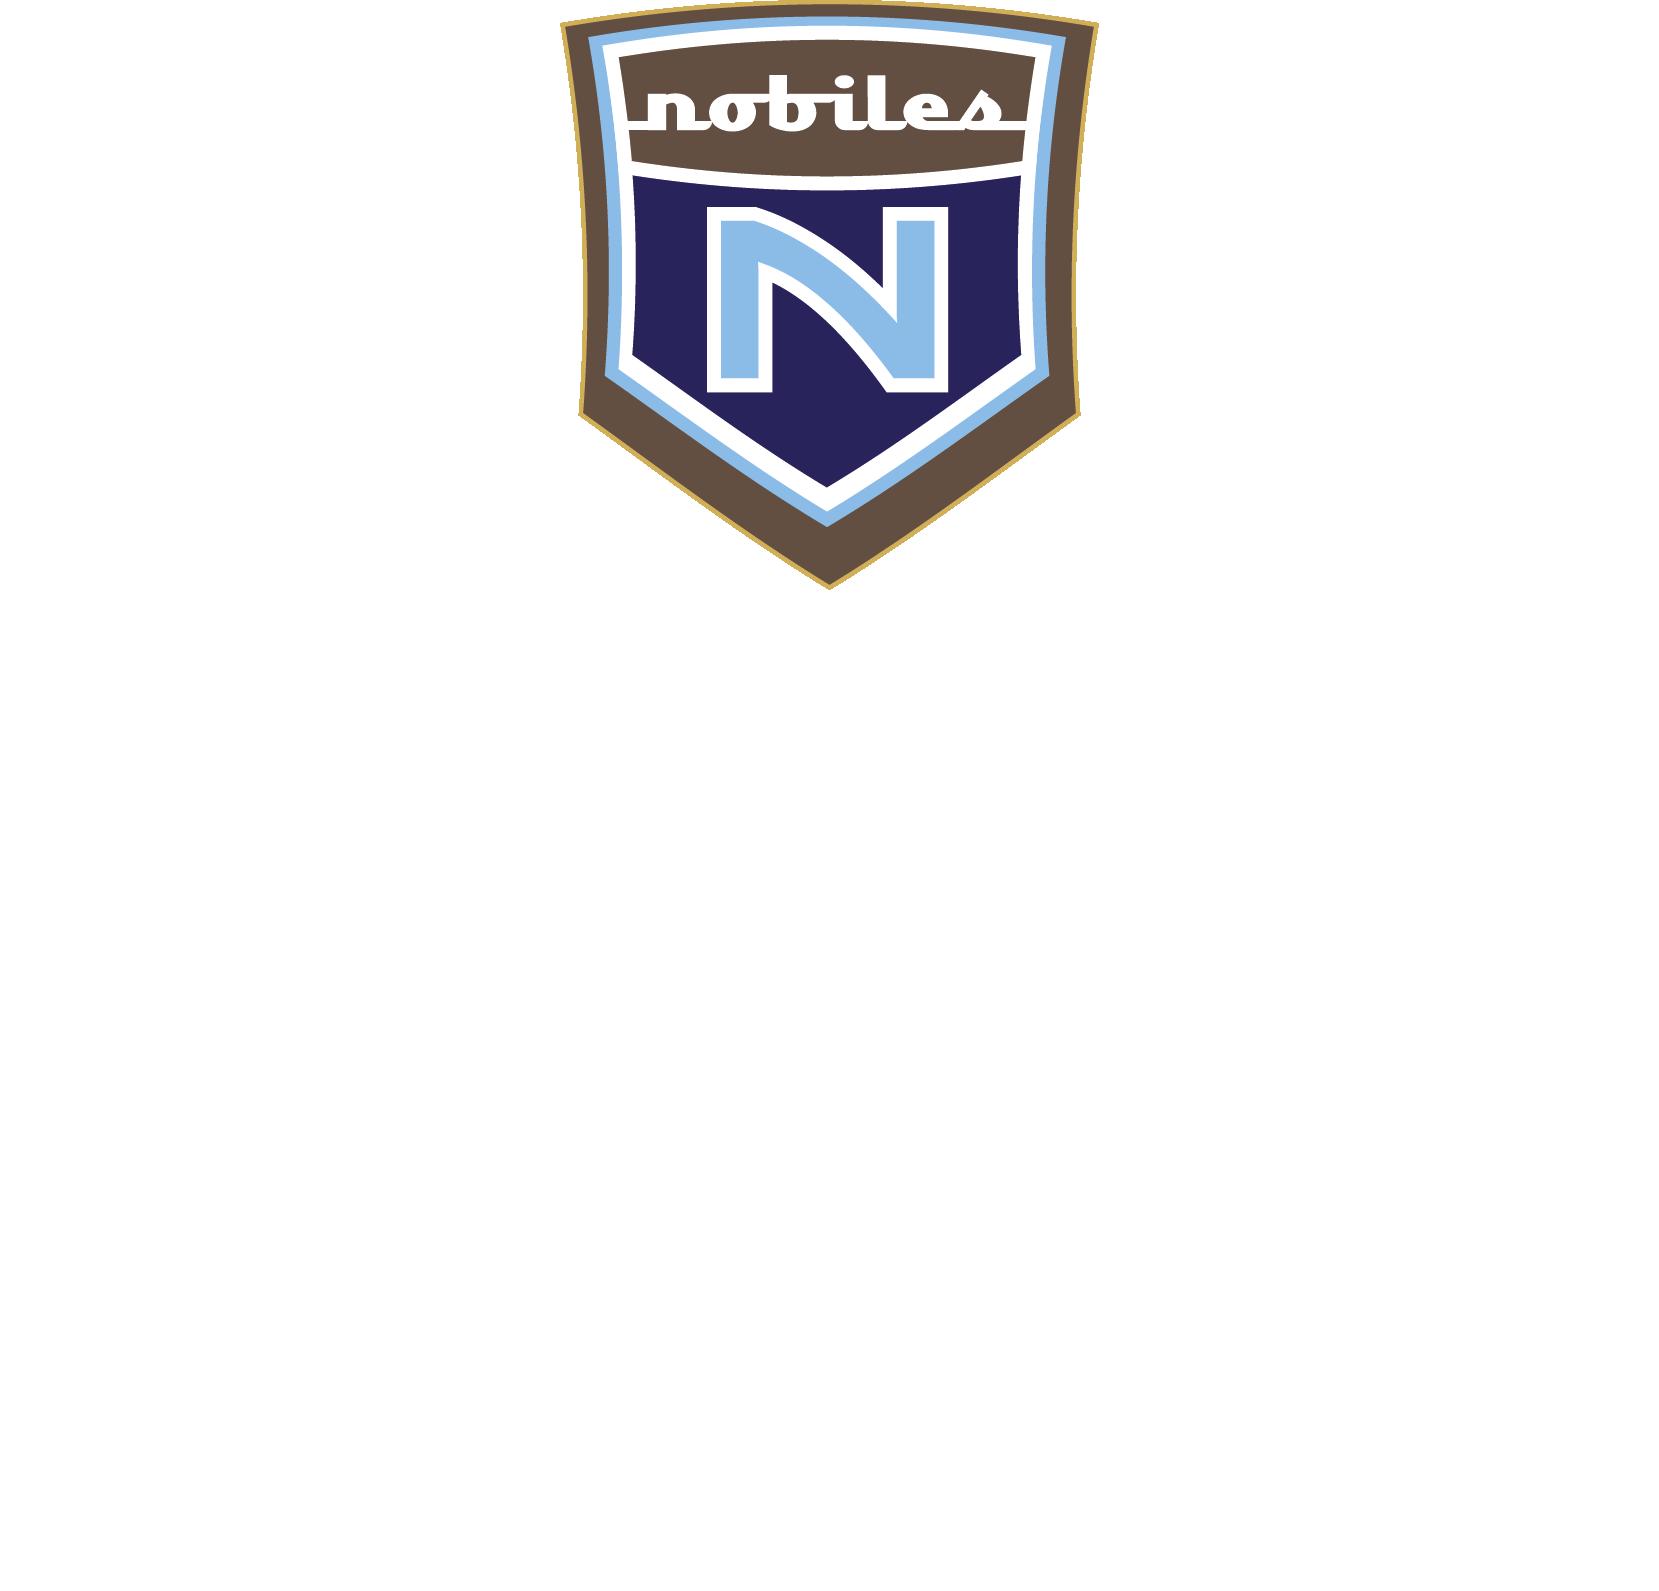 1.Nobiles_wapen_FC_HR1.png